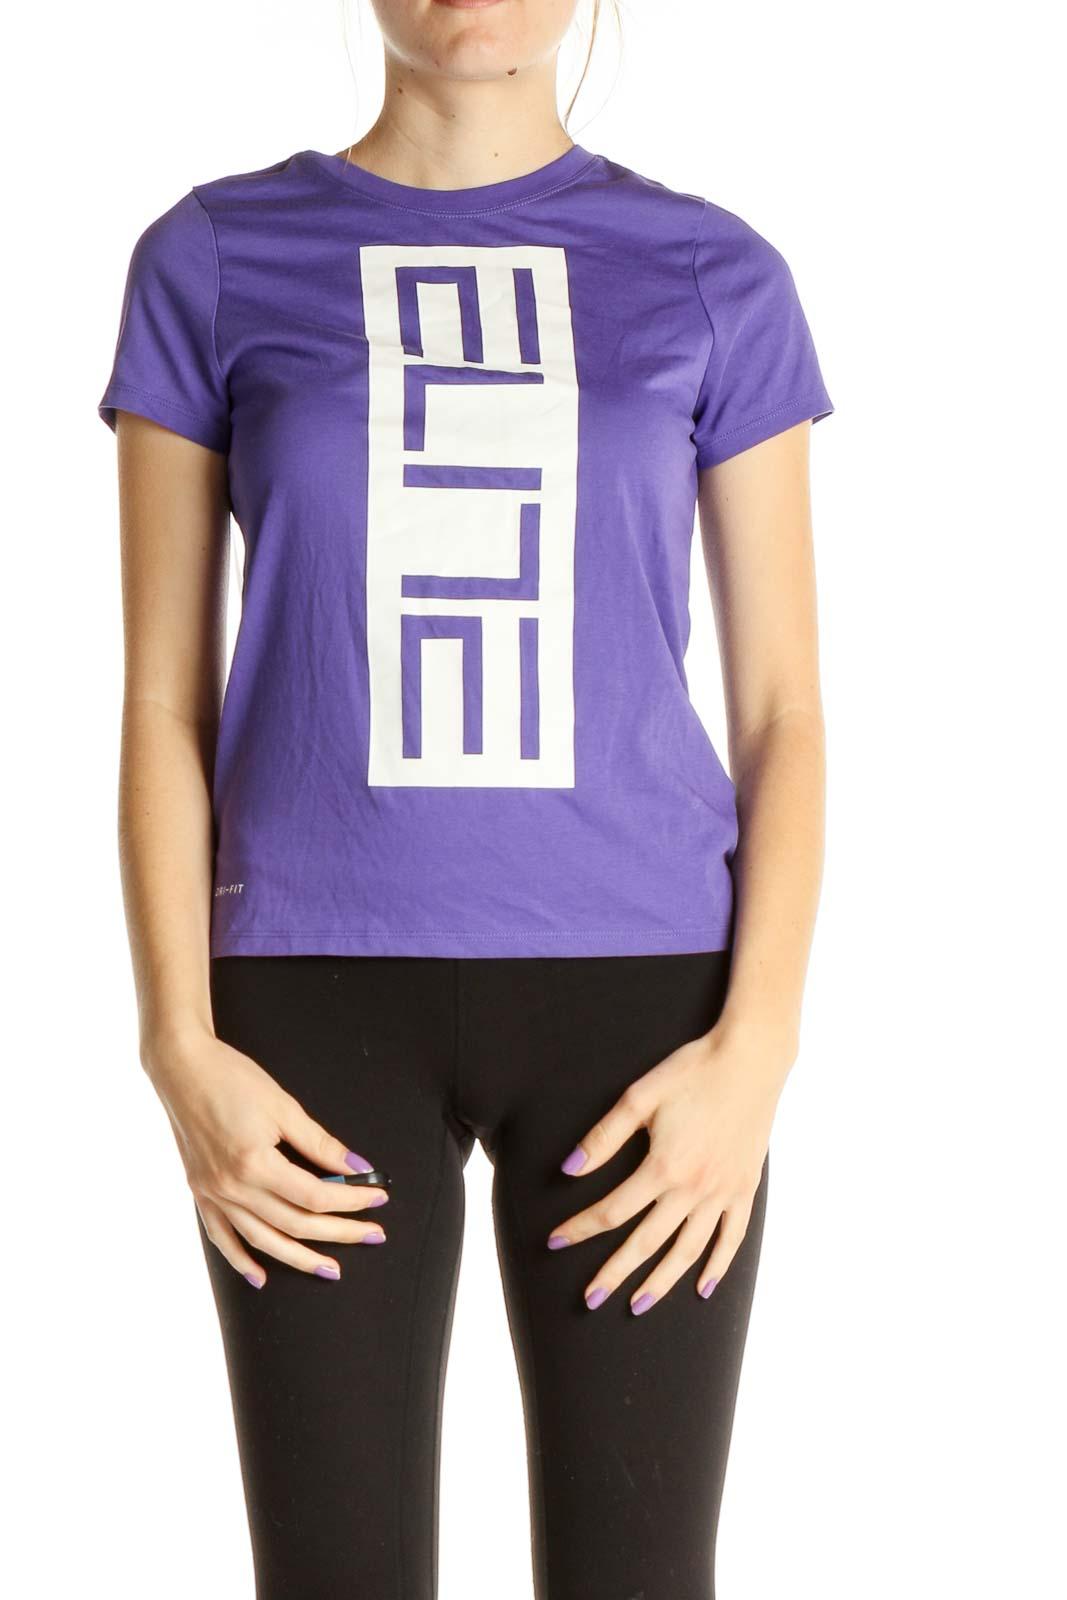 Purple Graphic Print Activewear T-Shirt Front